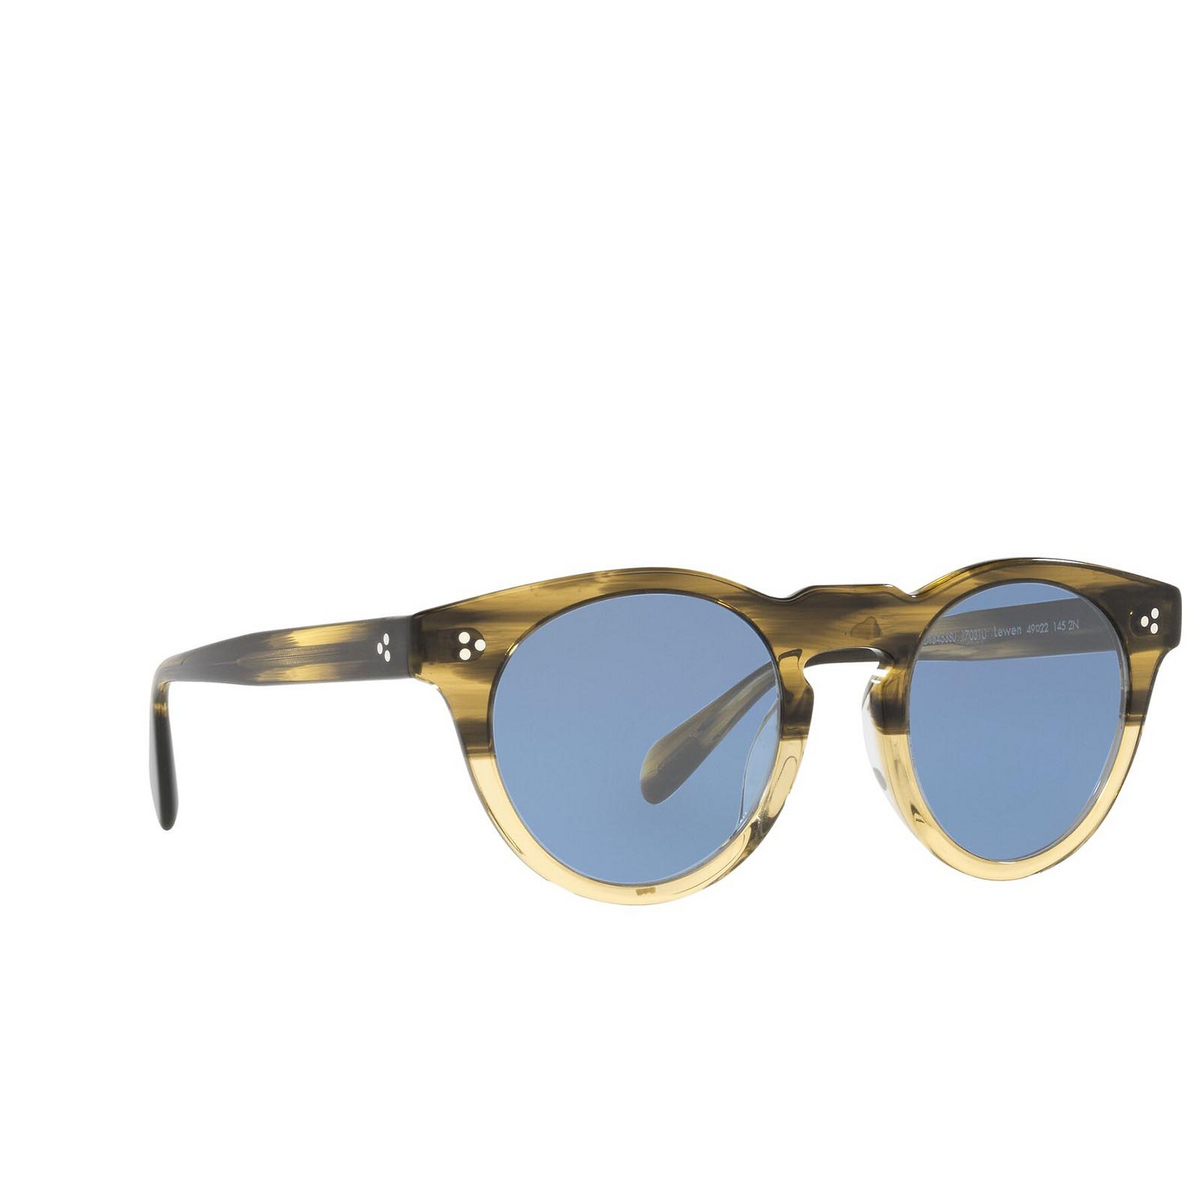 Oliver Peoples® Round Sunglasses: Lewen OV5453SU color Canarywood Gradient 17031U - three-quarters view.